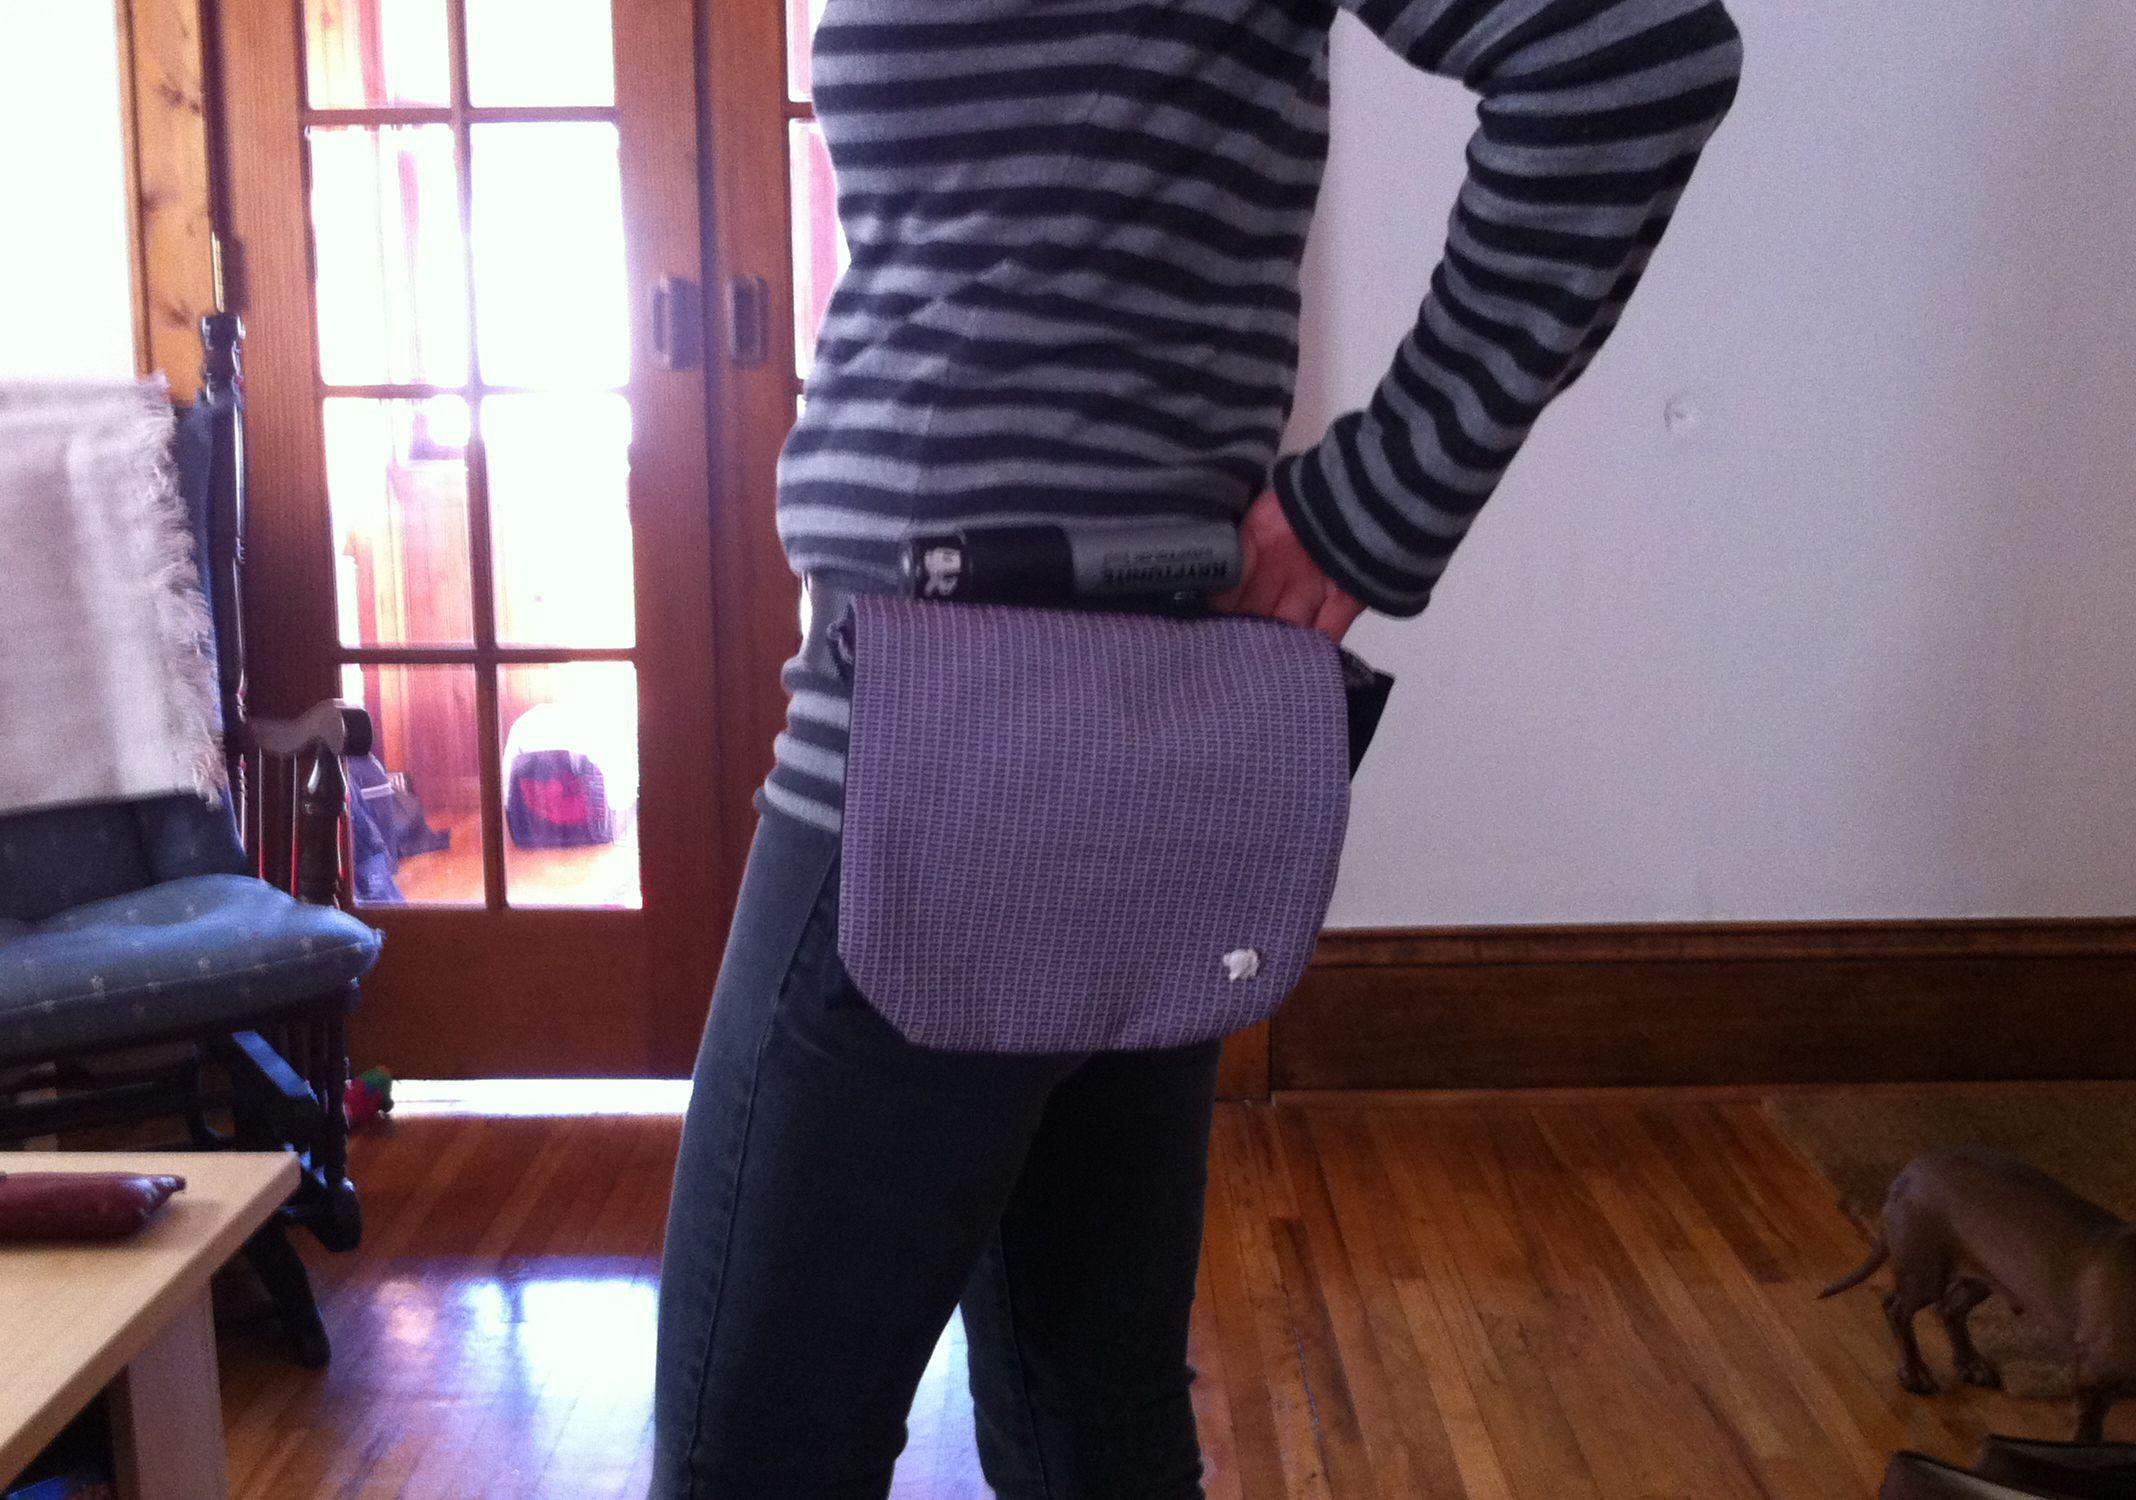 a5fe27ec47b2e4 do-it-yourself hip bags (alright